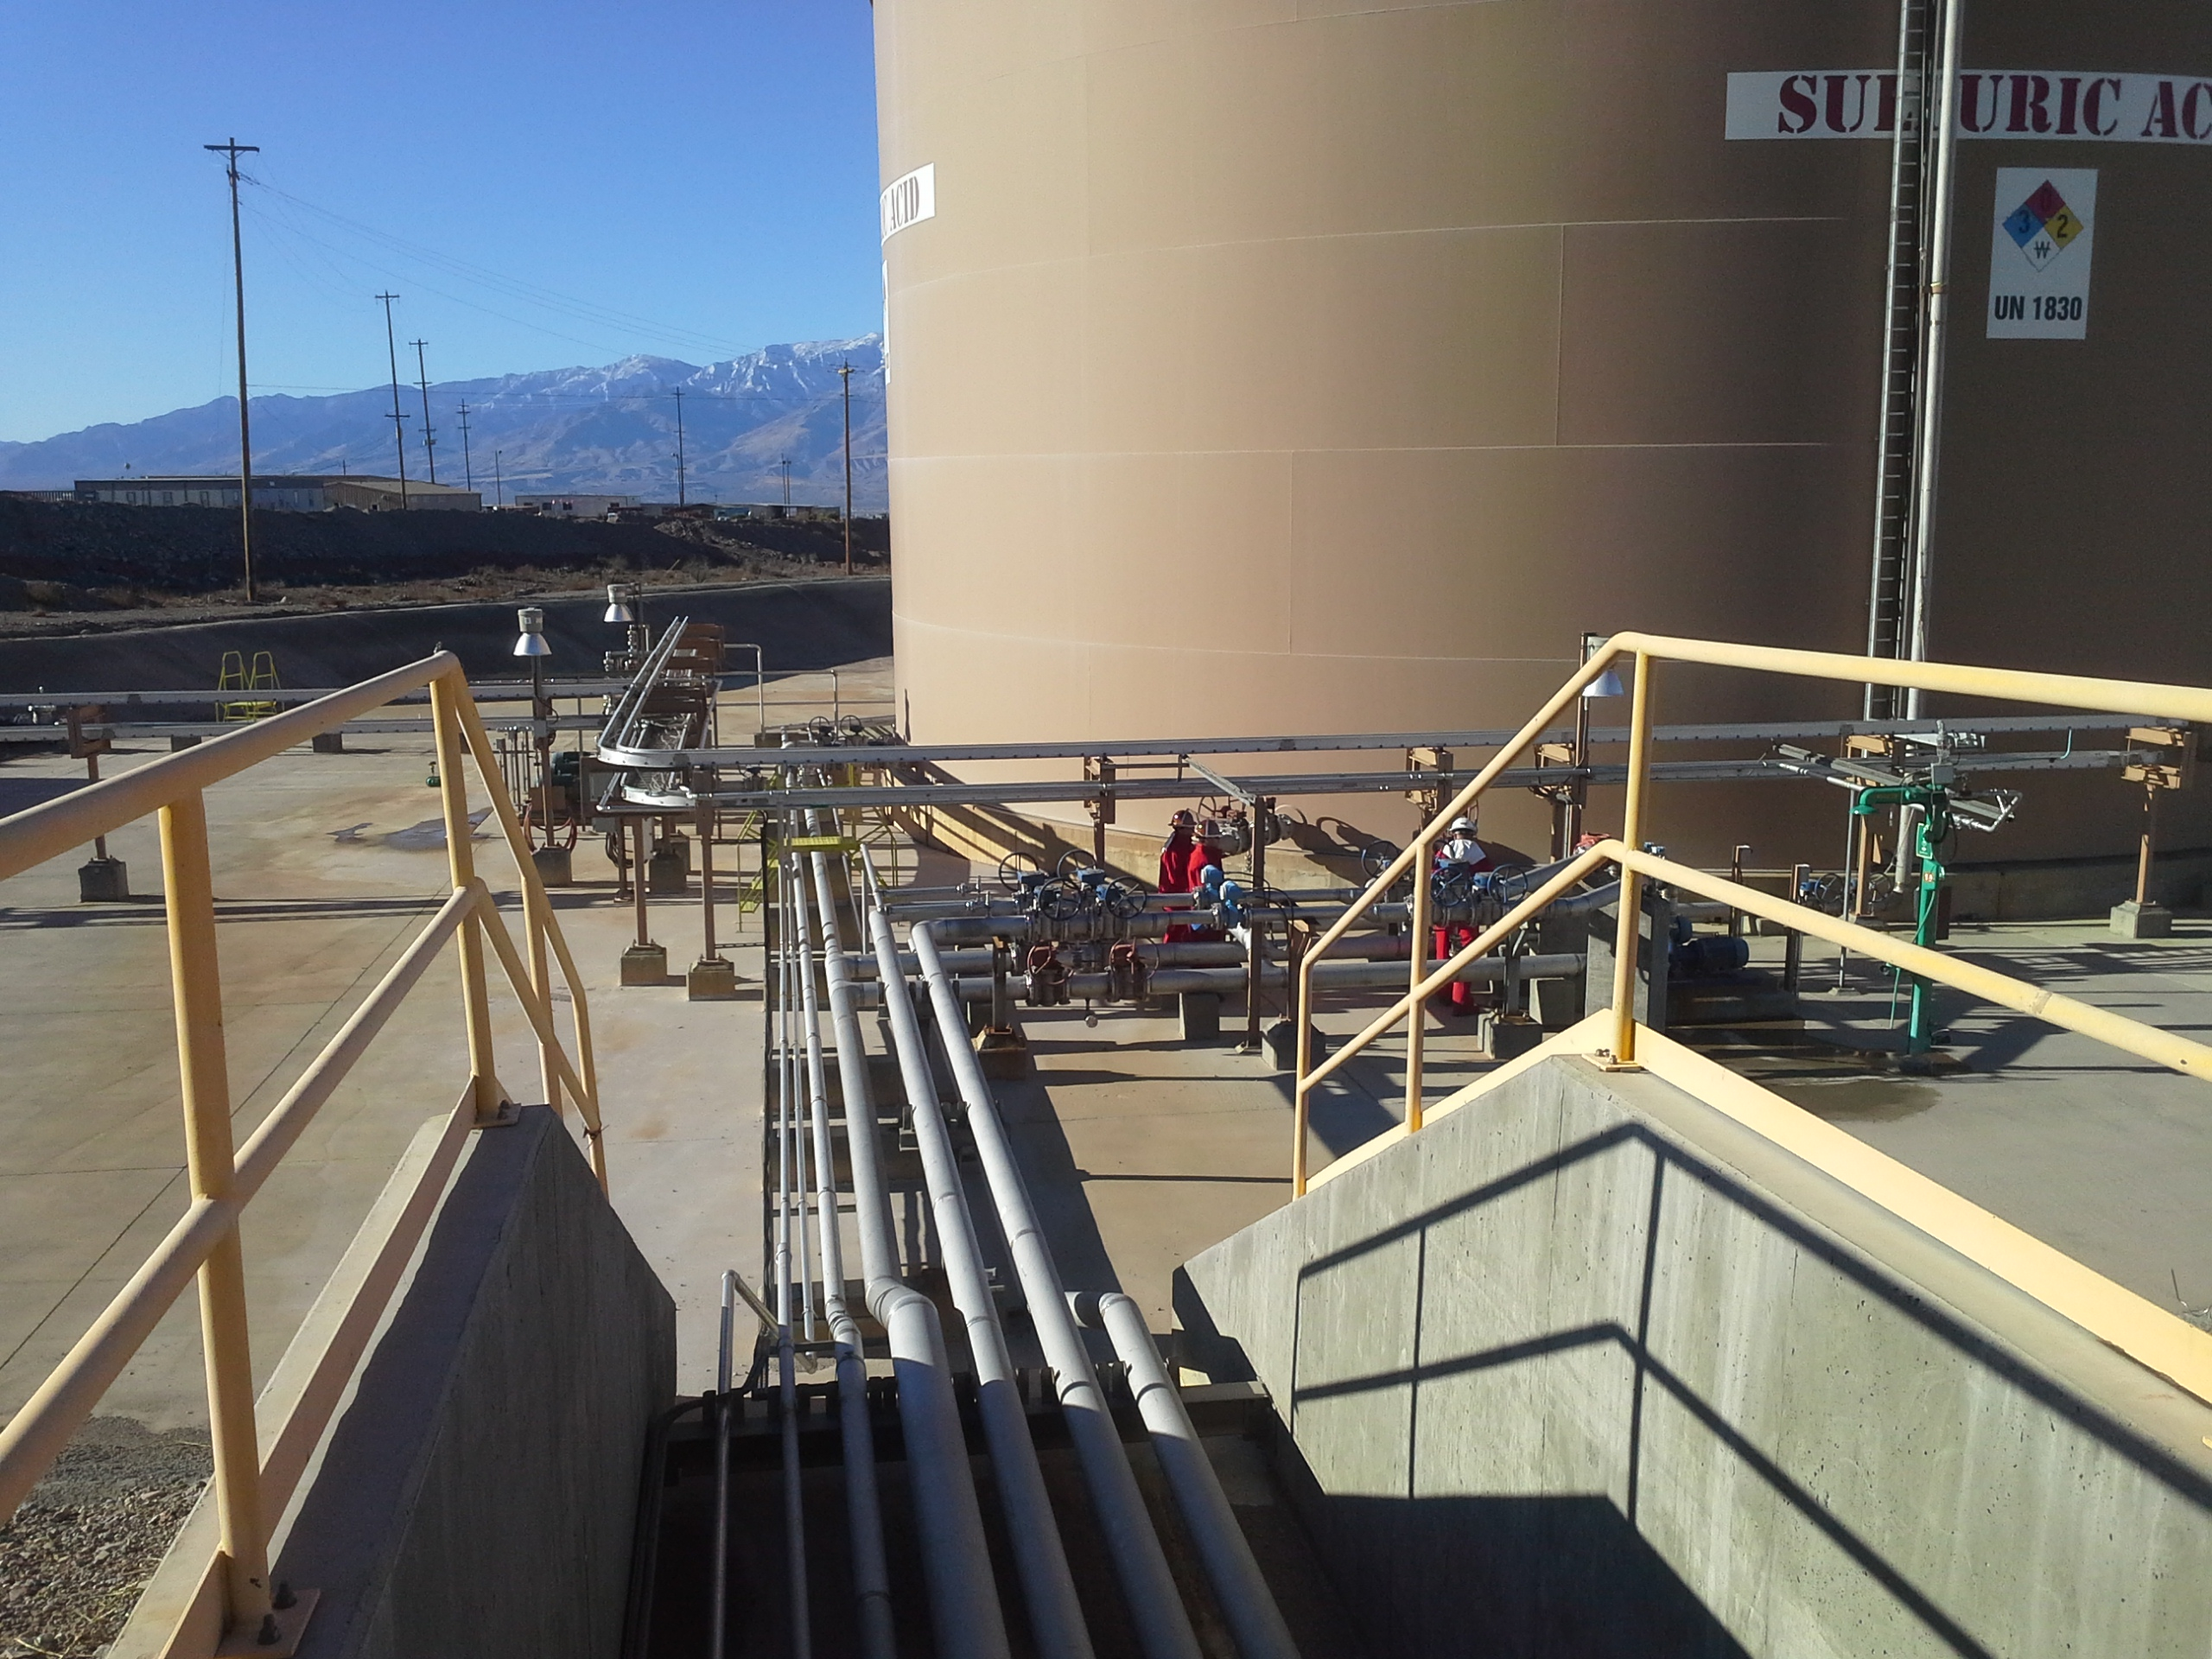 Hanlon Engineering Acid Tank & Piping